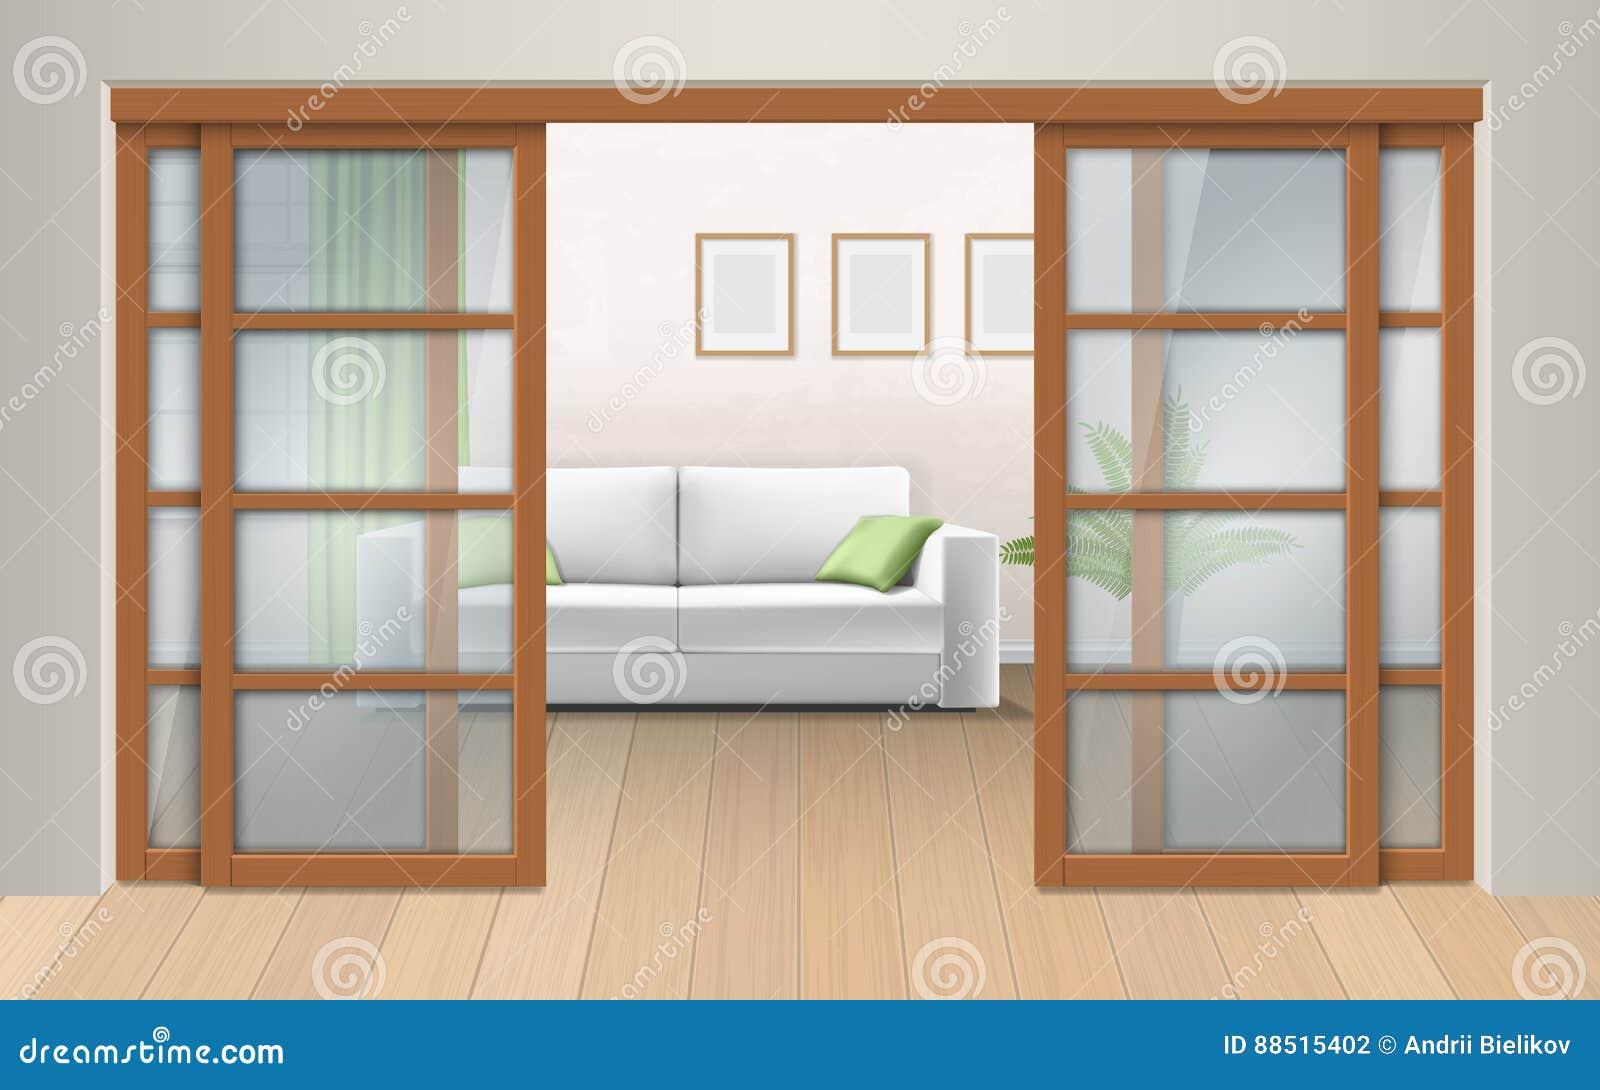 Living Room Interior With Sliding Doors Stock Vector Illustration